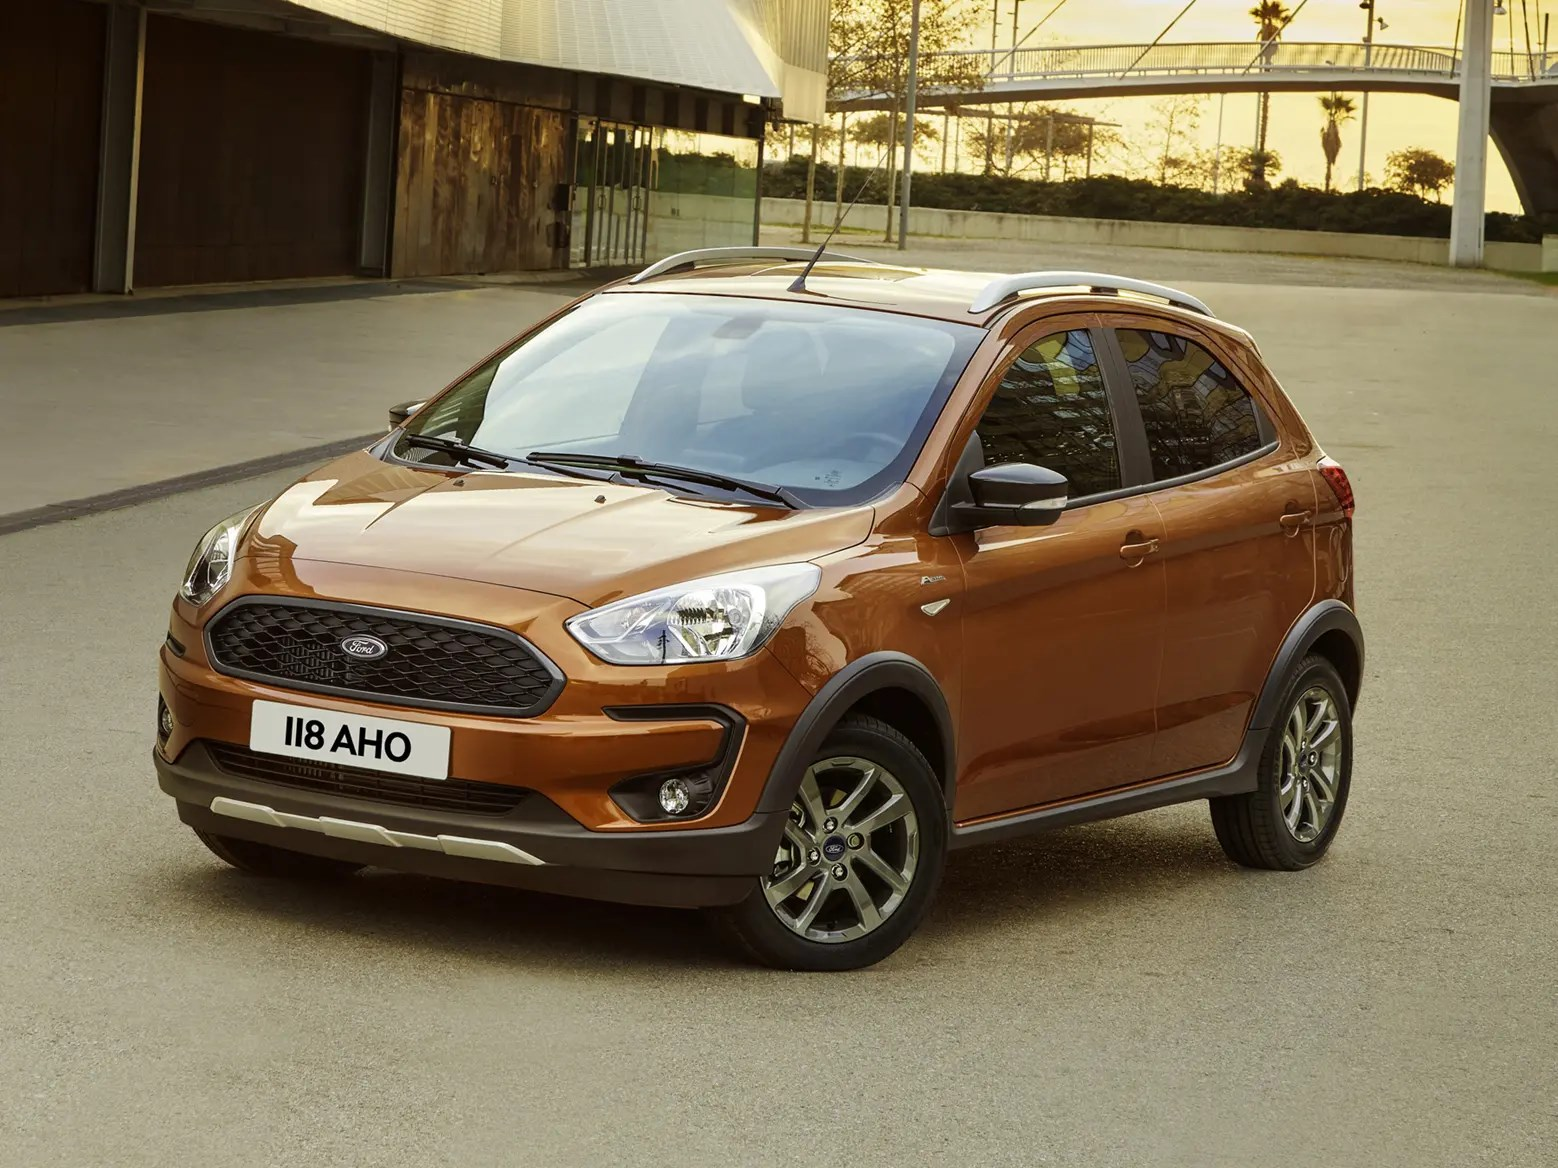 Ford axes Ka+ and Ka+ Active; Fiesta gets new base model  Parkers